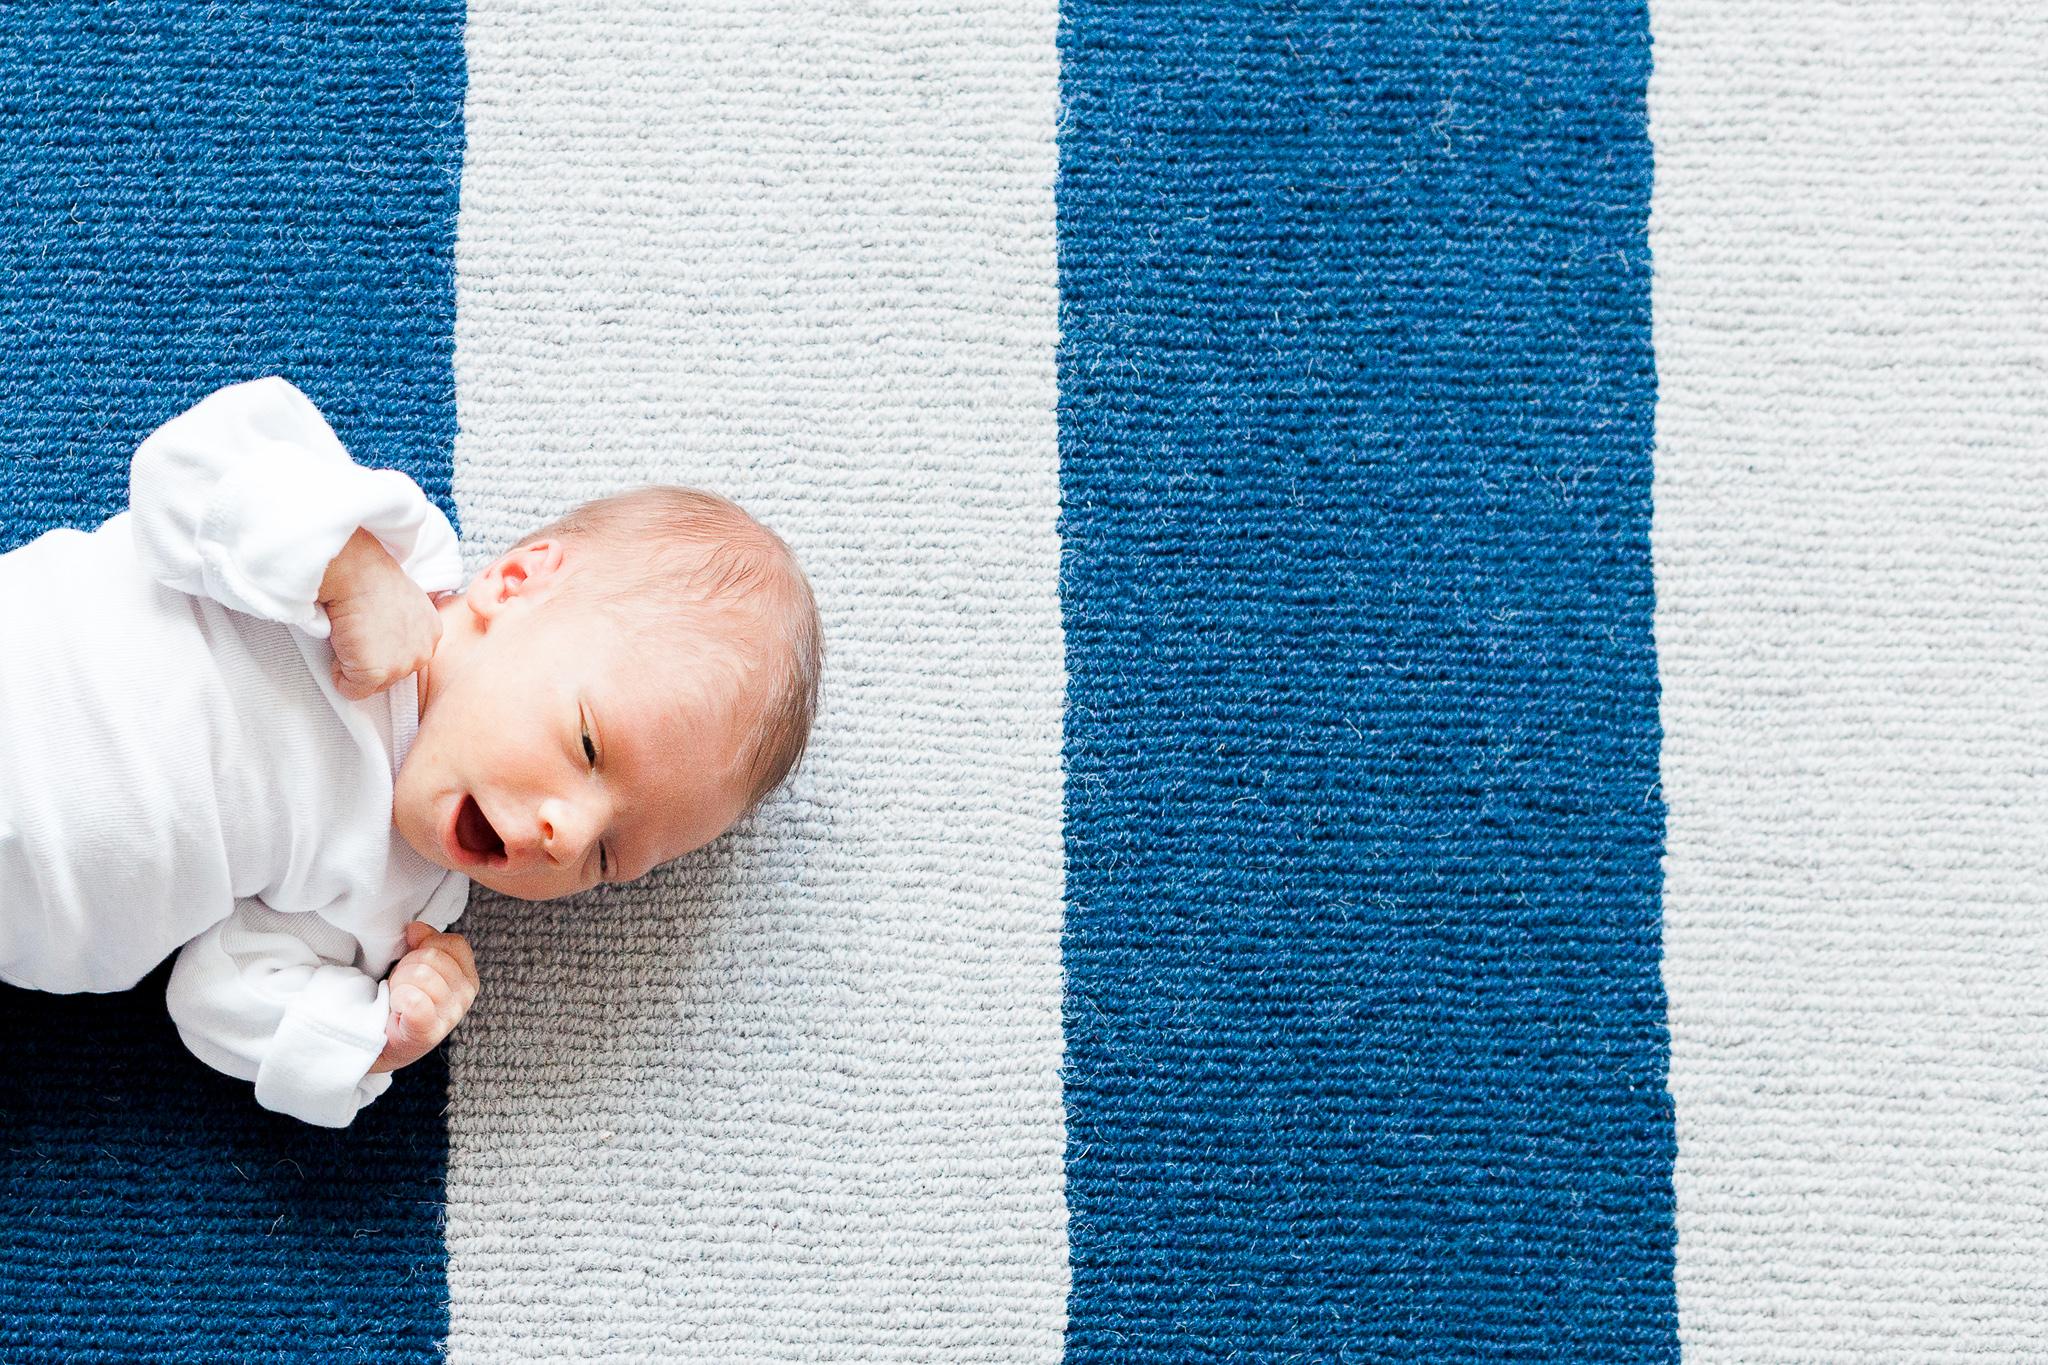 nyc_newborn_photography